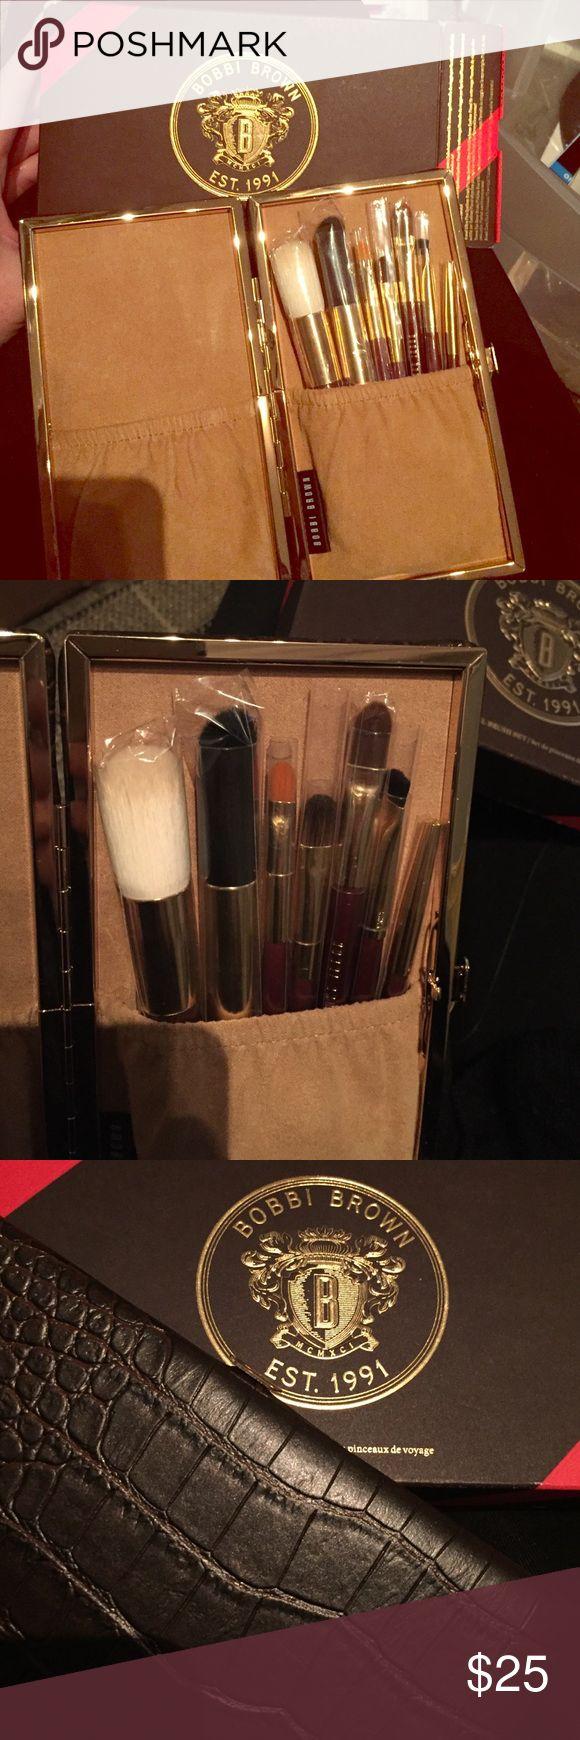 Bobbi Brown brush set, brand new, orig $55 Bobbi brown brush set with seven brushes in a luxurious brown faux croc set. Never used! Bobbi Brown Makeup Brushes & Tools